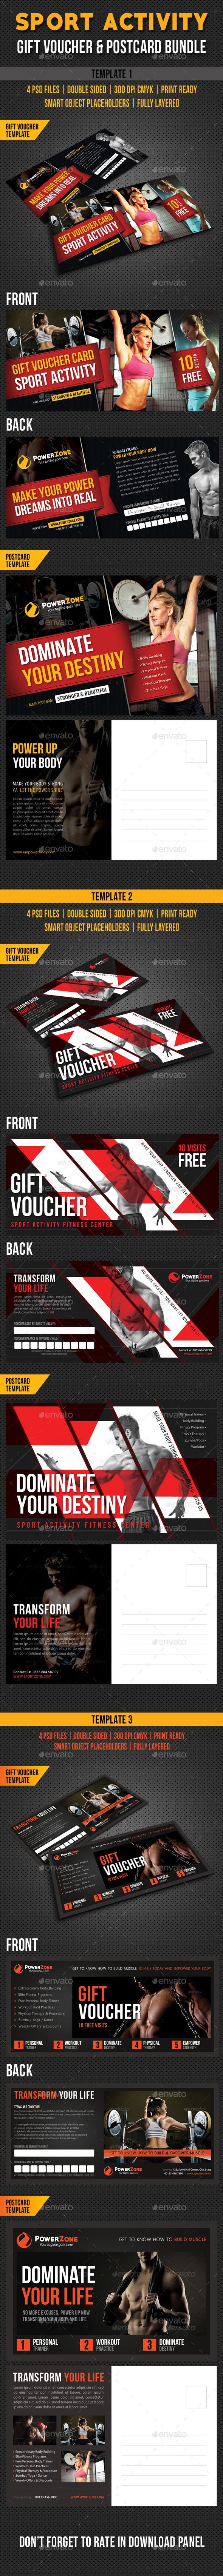 GraphicRiver 3 Sport Activity Gift Voucher and Postcard Bundle 10550350